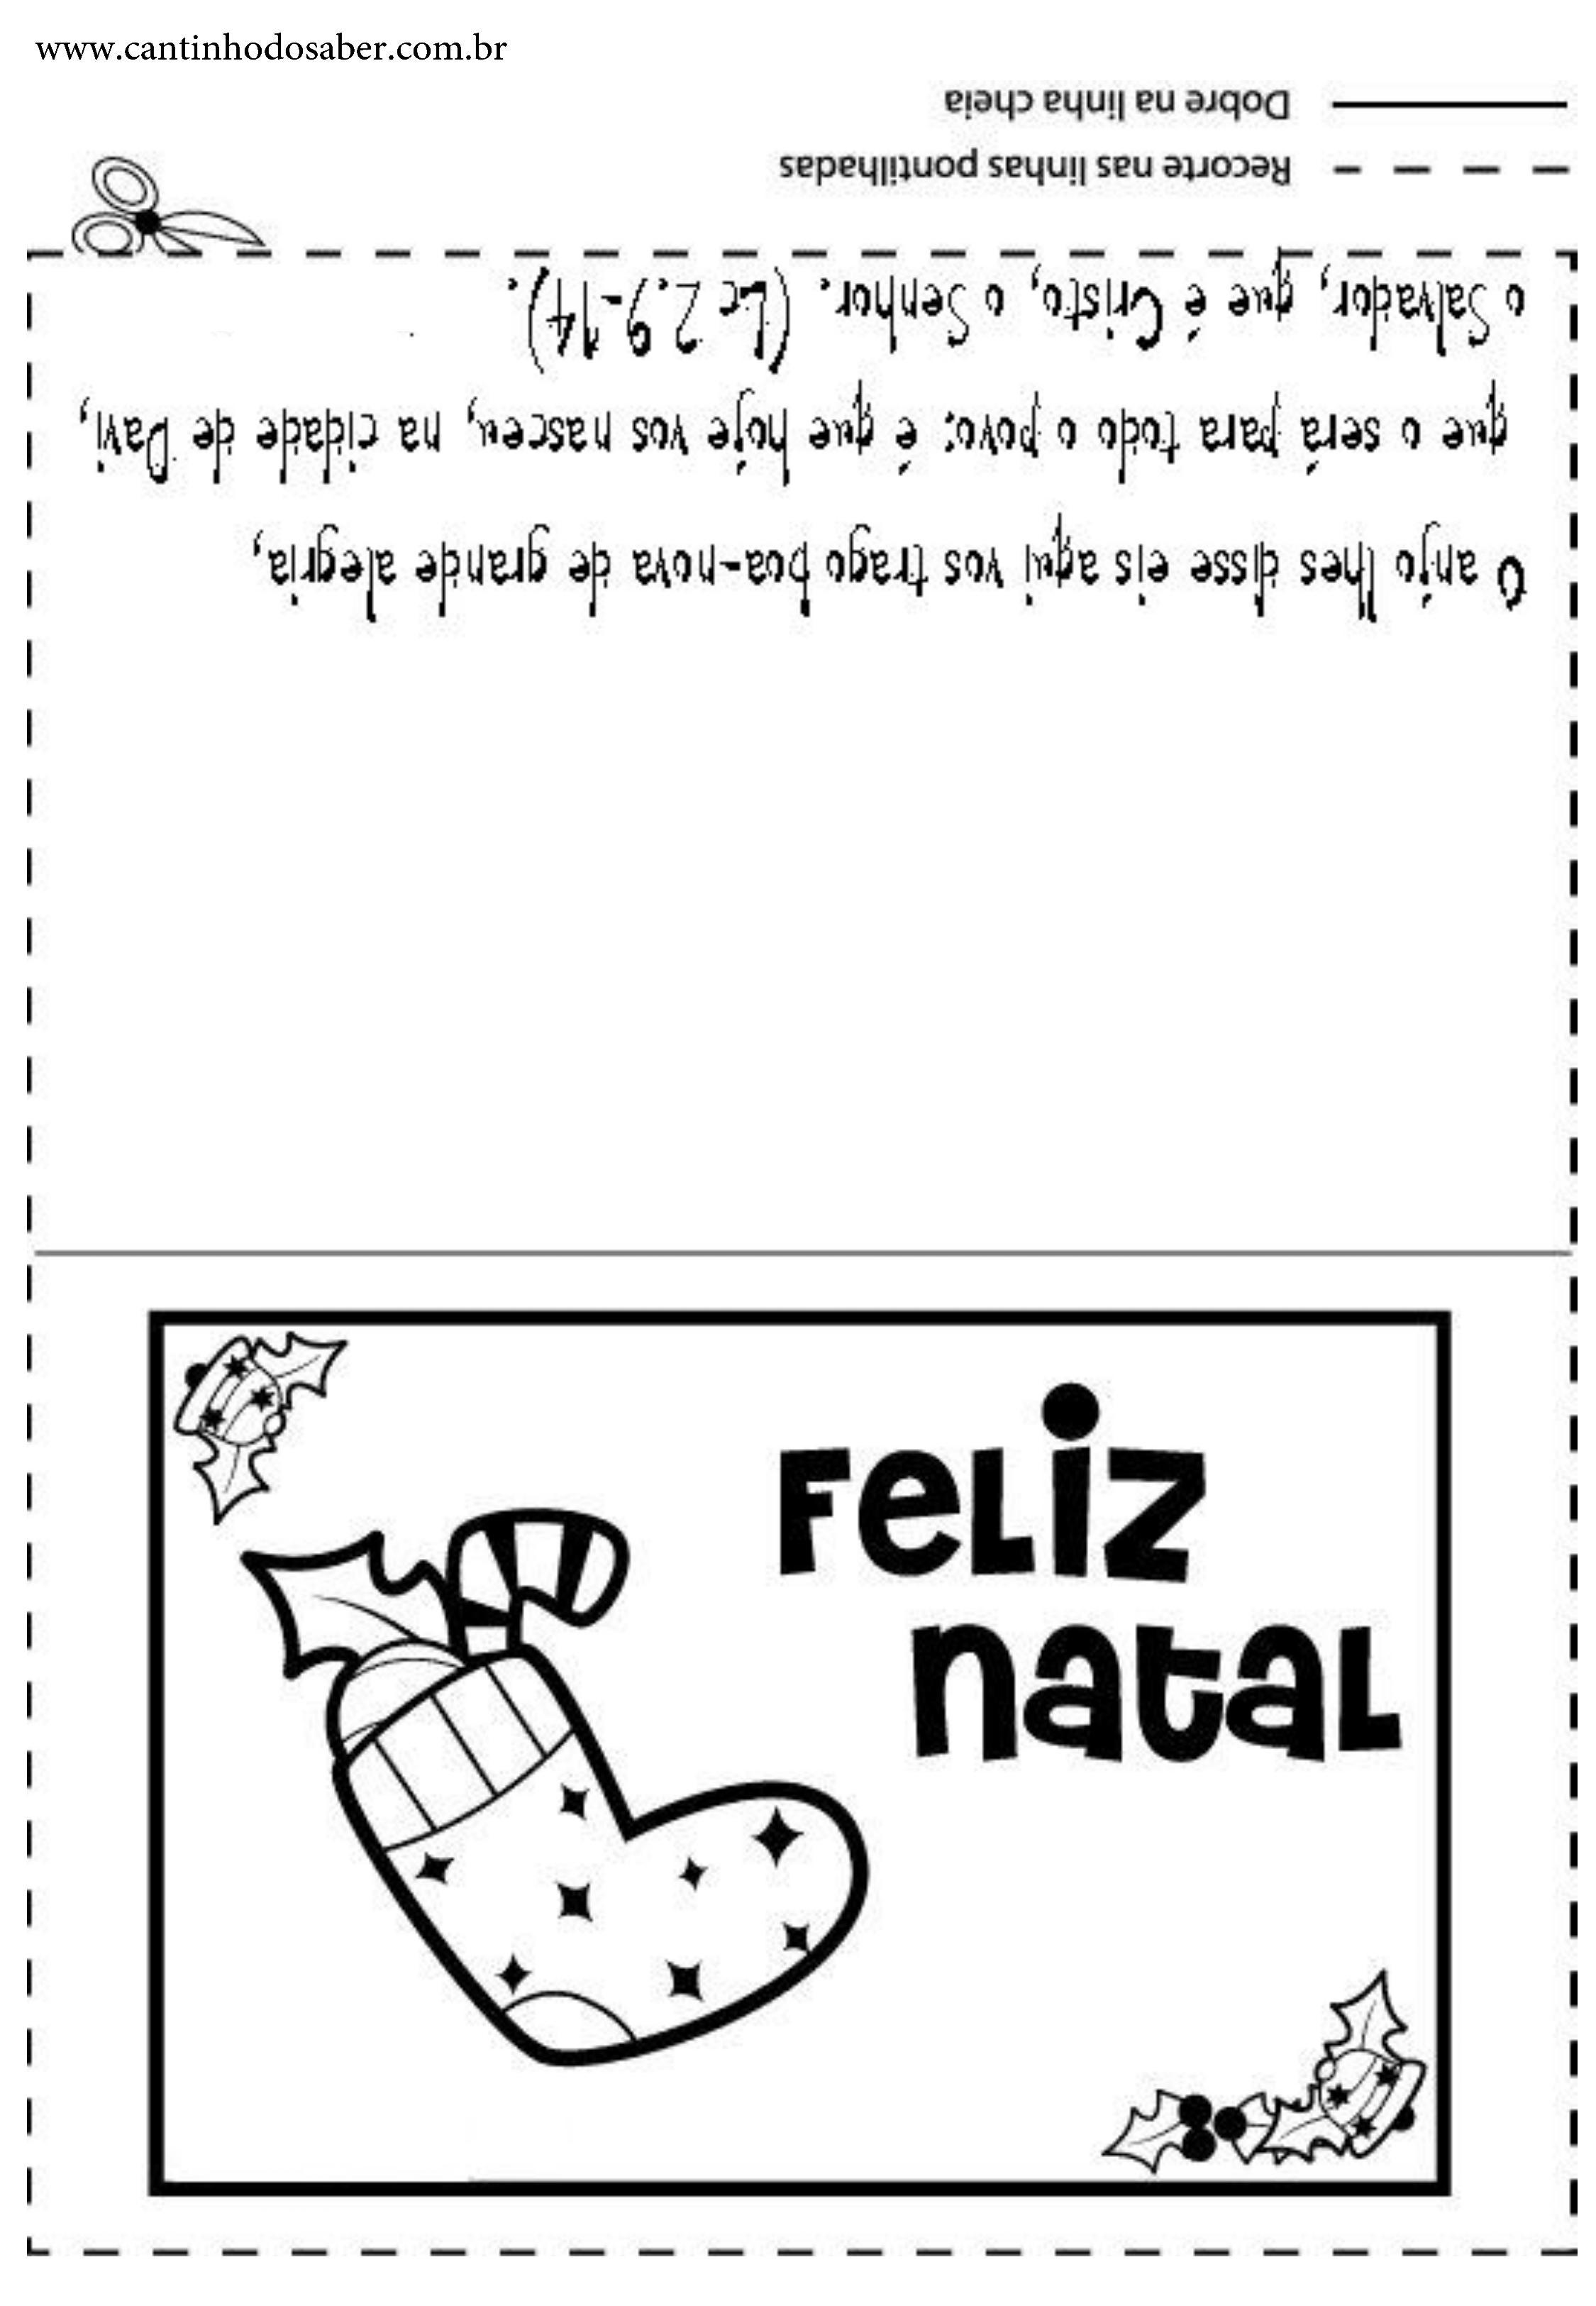 imagens para cart o de natal do papai noel para colorir